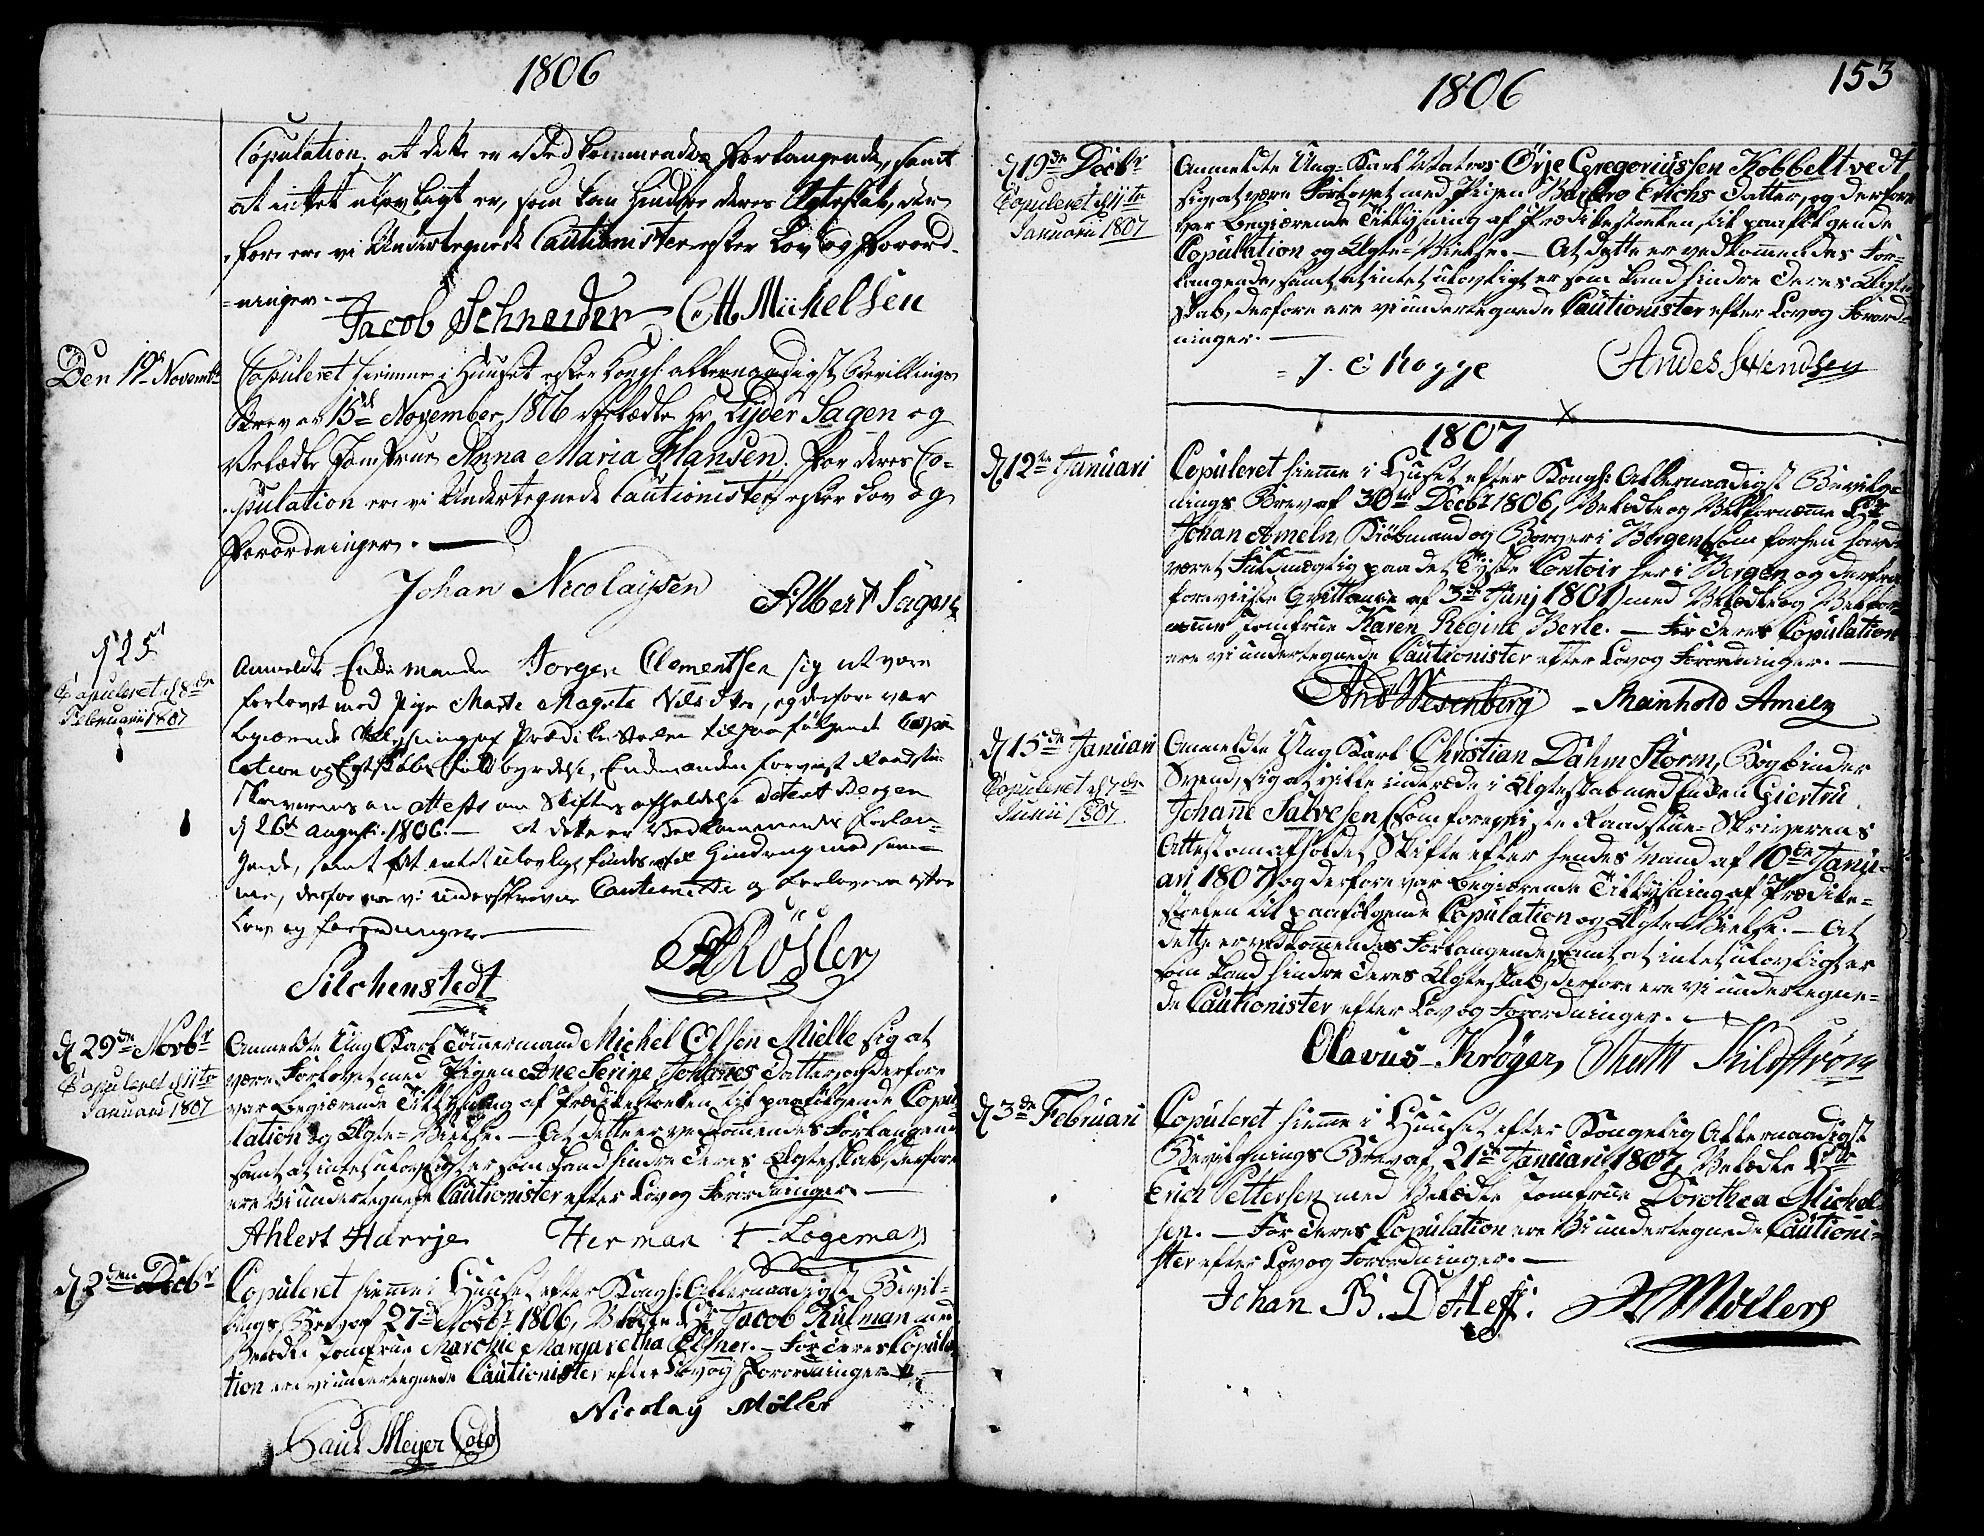 SAB, Nykirken Sokneprestembete, H/Haa: Ministerialbok nr. A 8, 1776-1814, s. 153